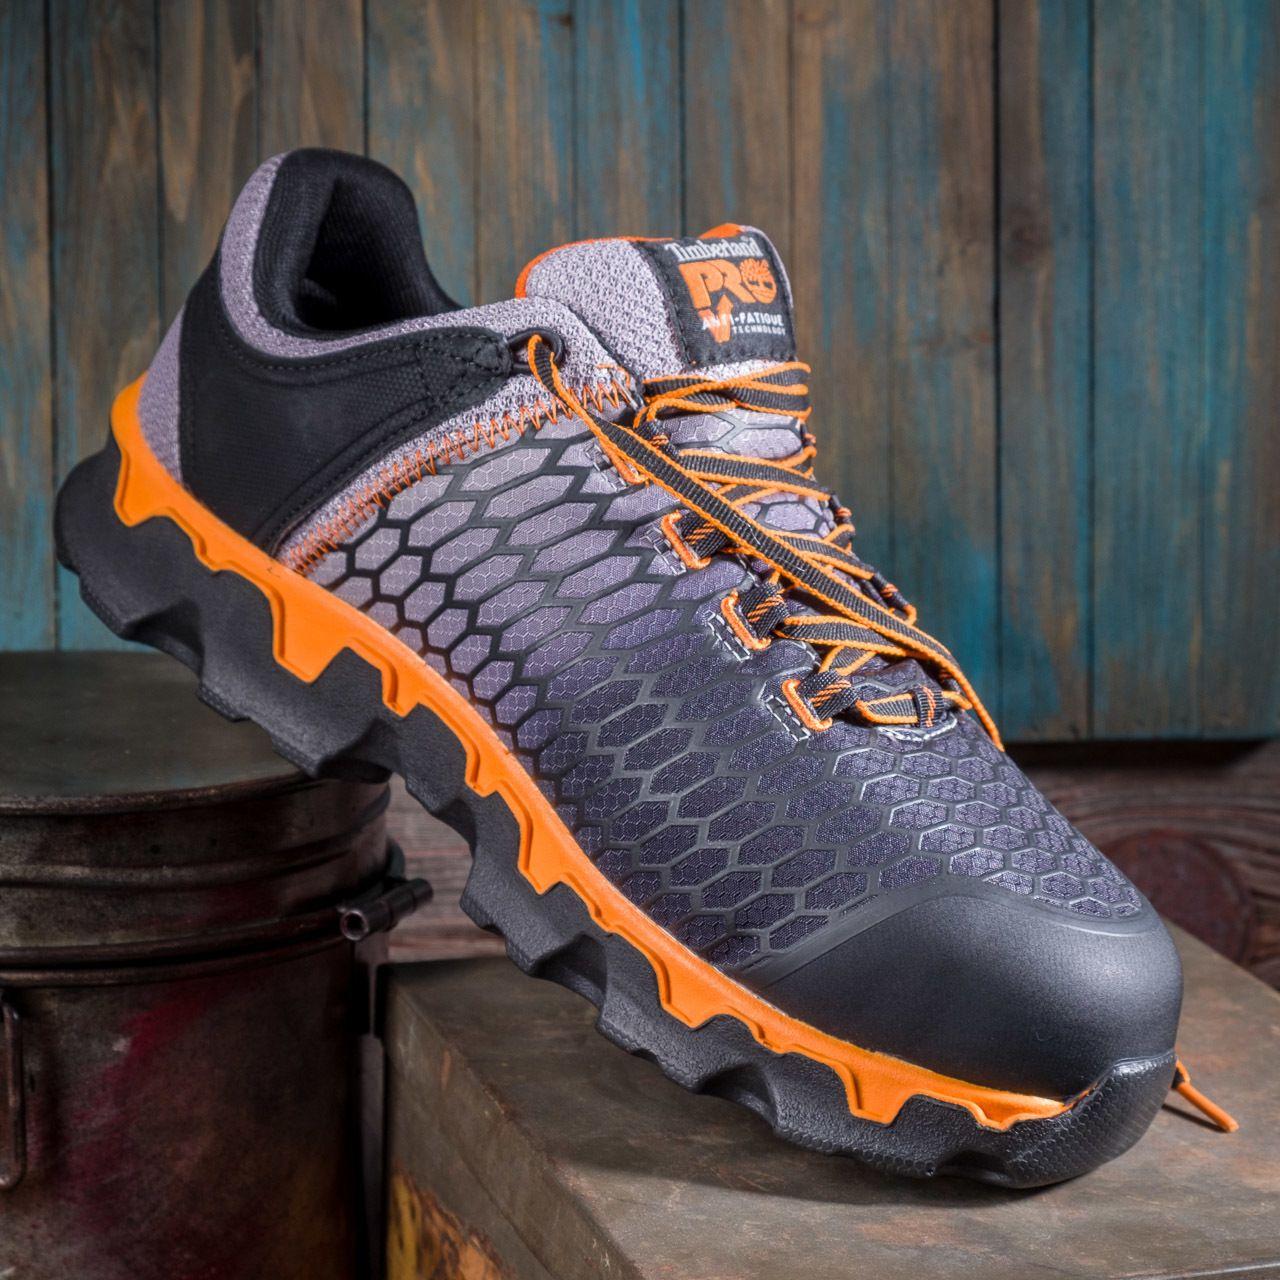 A rayas navegador País de origen  Pin on Best Men's Safety Boots and Shoes